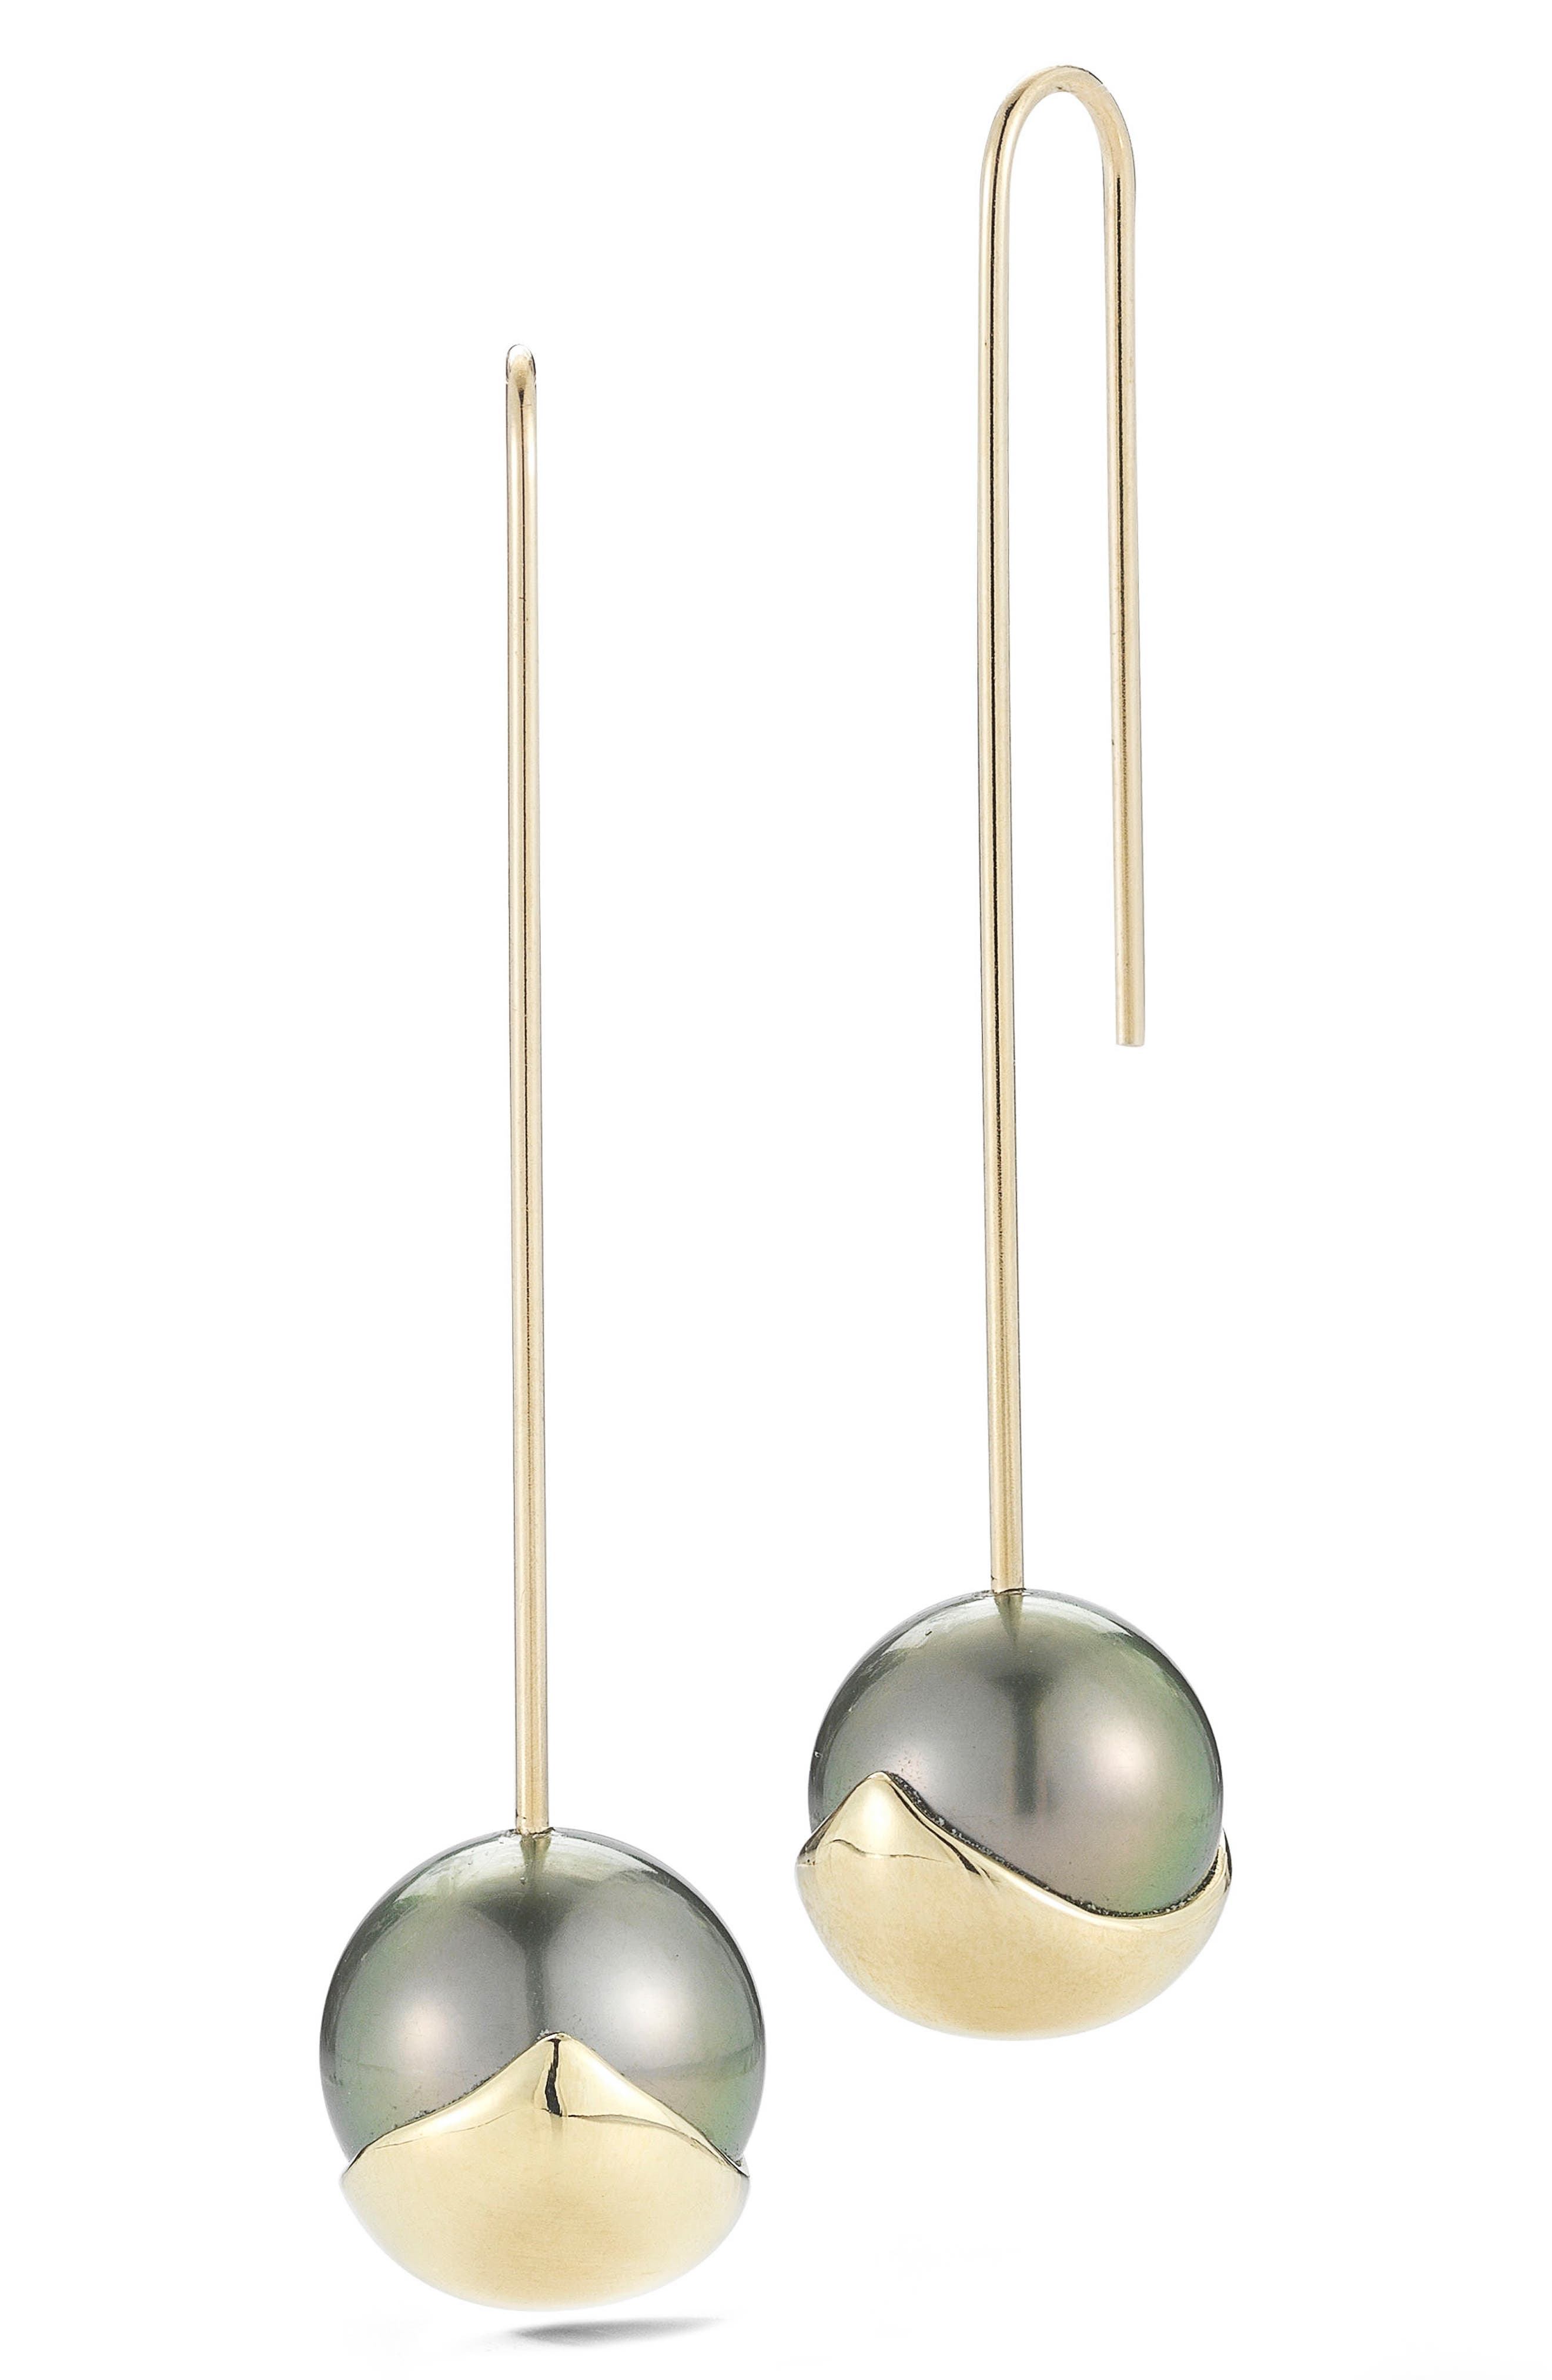 Sea of Beauty Pearl Drop Earrings,                         Main,                         color, Yellow Gold/ Black Pearl